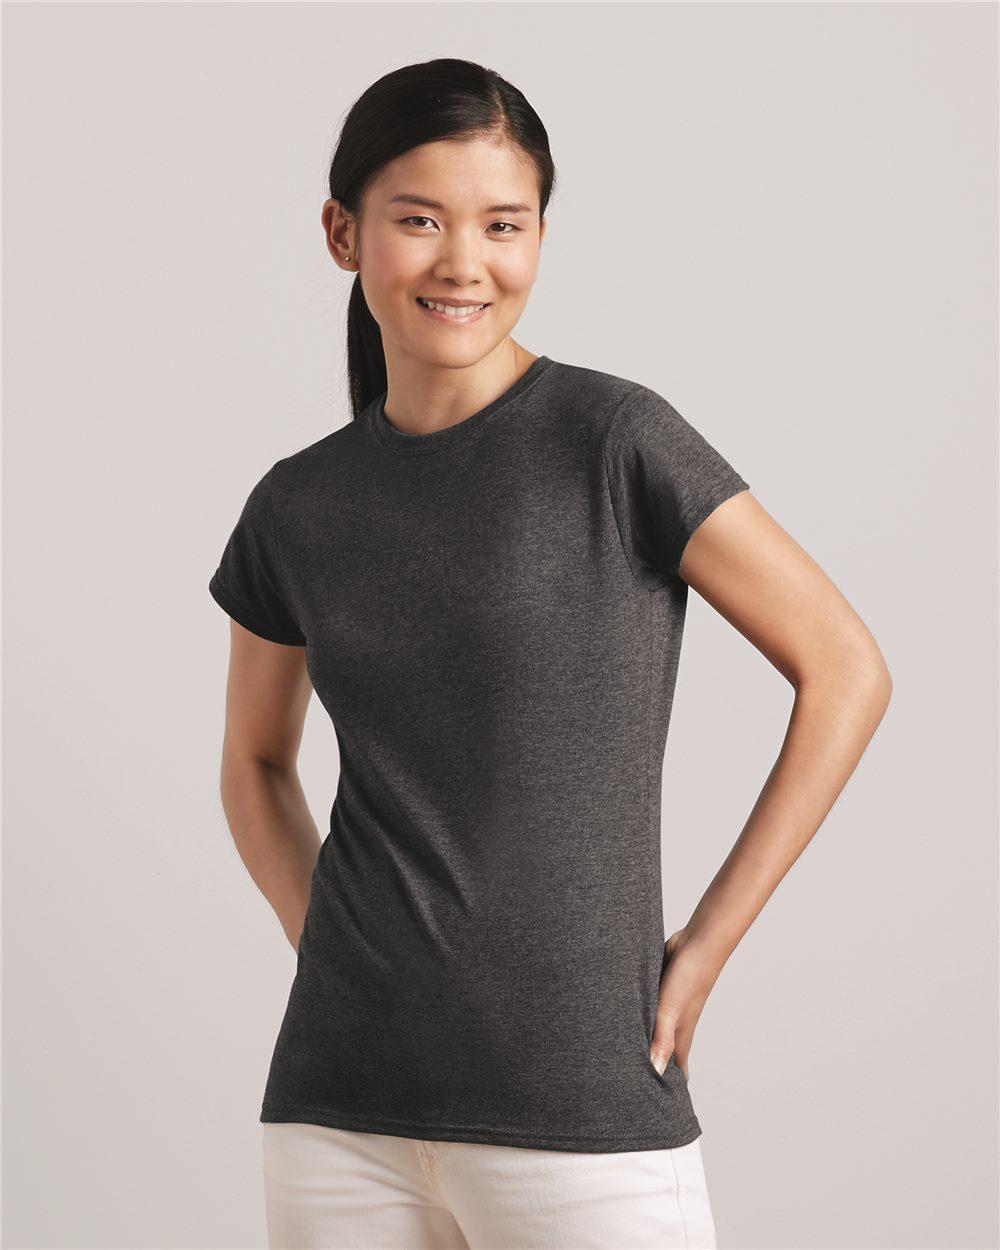 Gildan Softstyle Women's T-Shirt 64000L Starting at $3.50 Blank